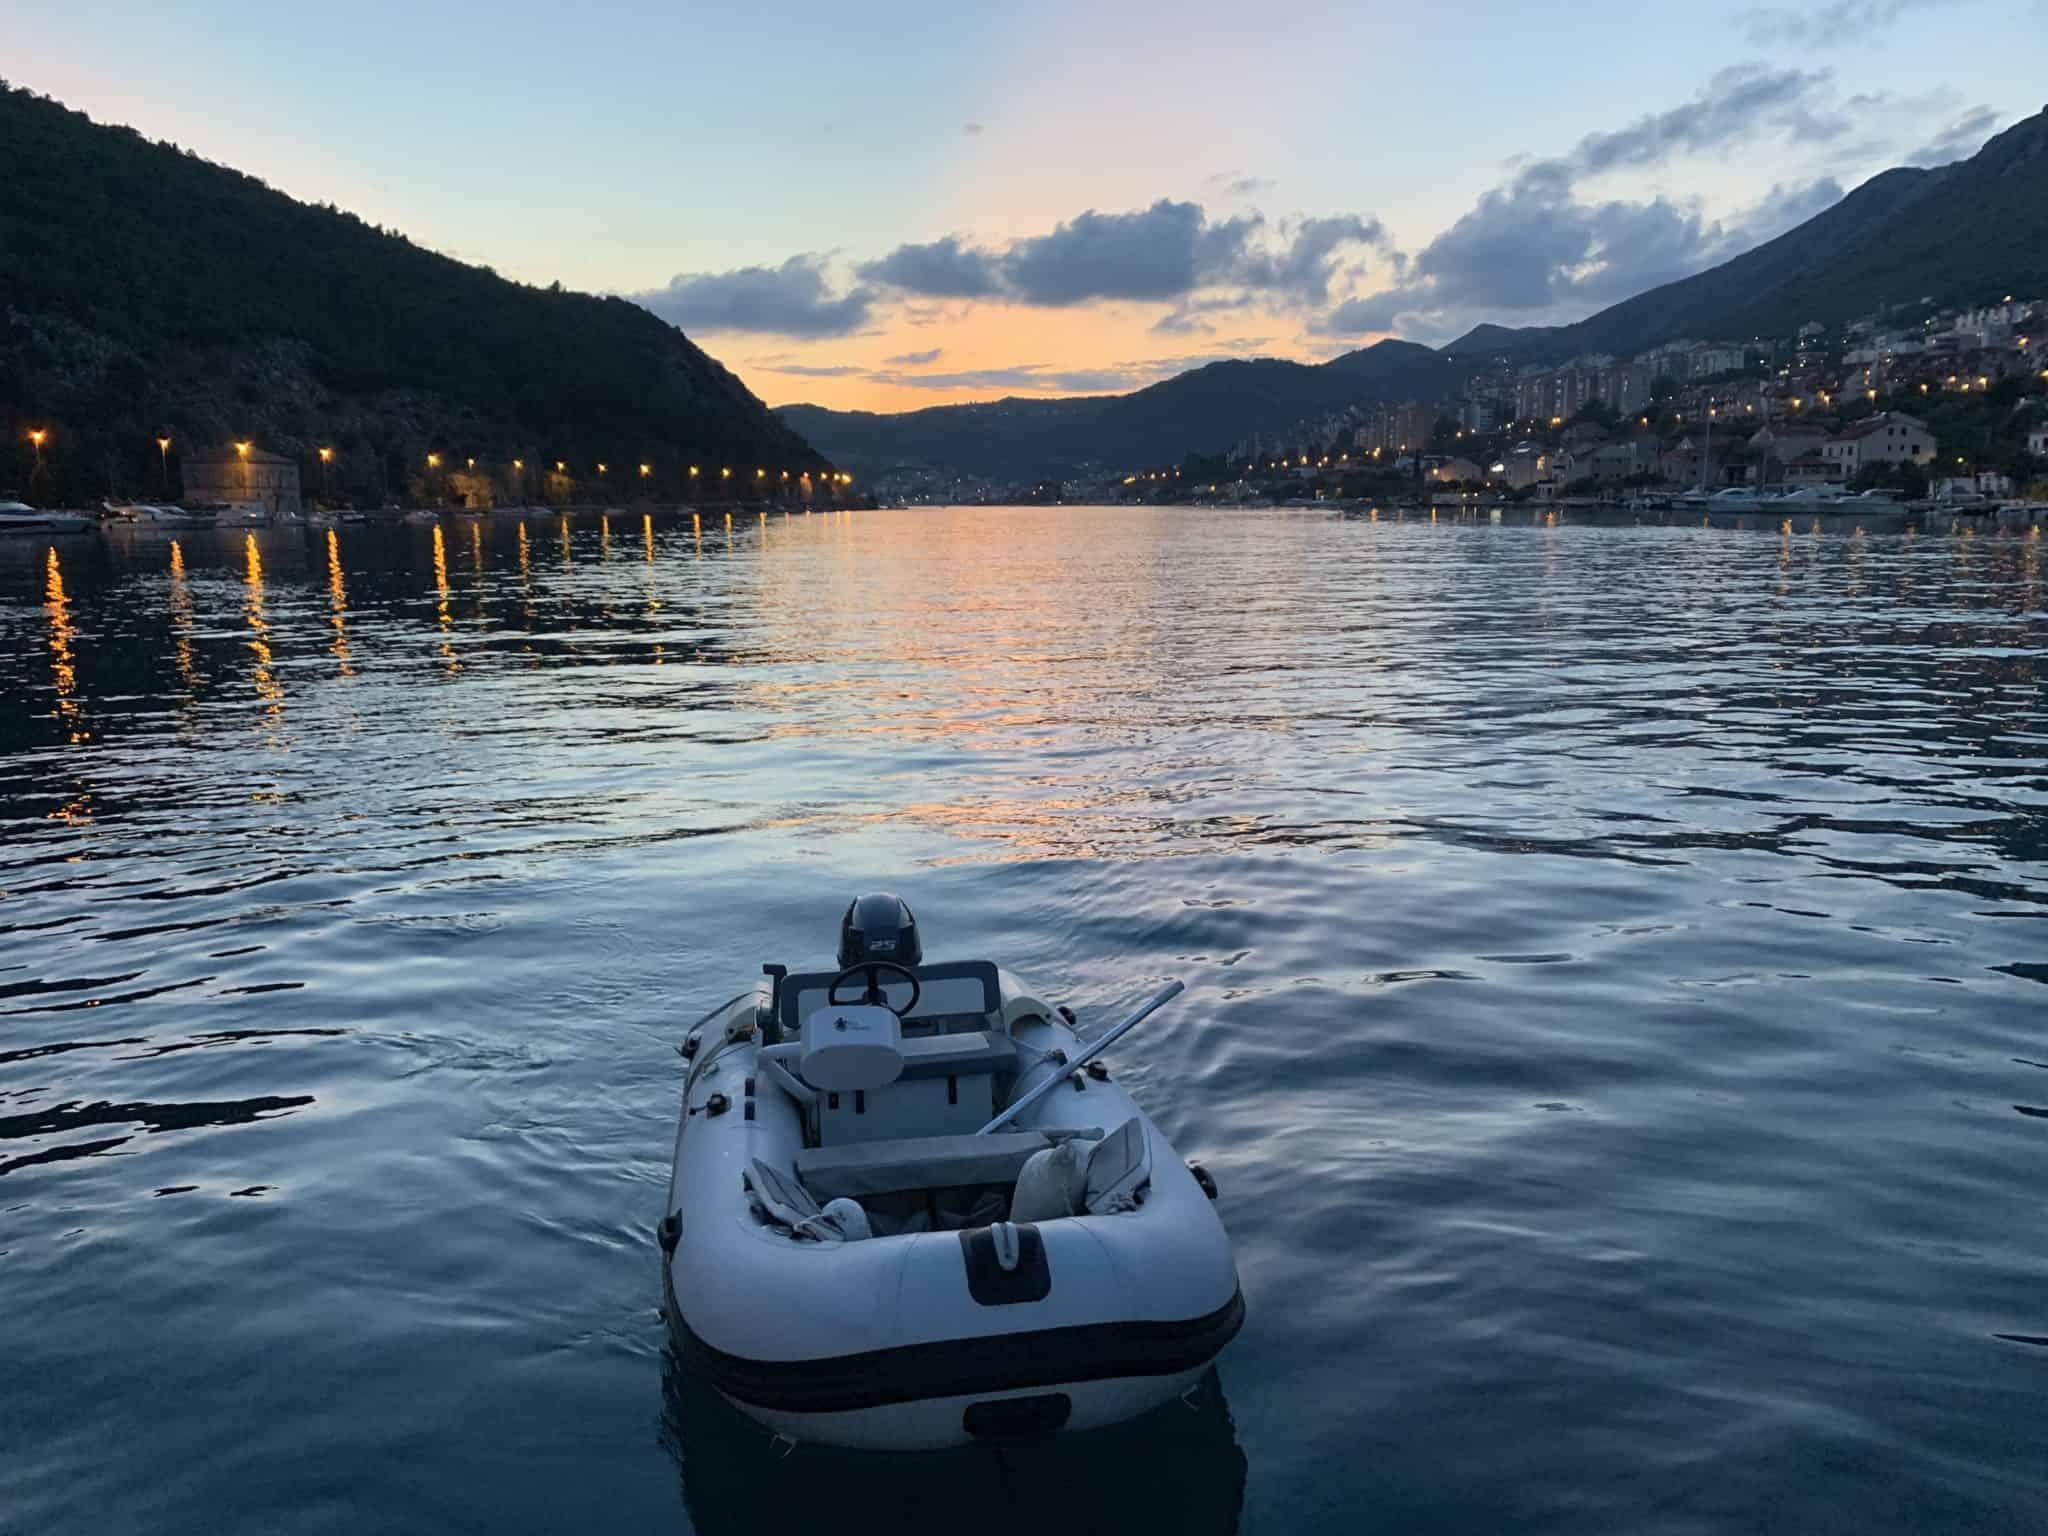 dinghy at night in Dubrovnik